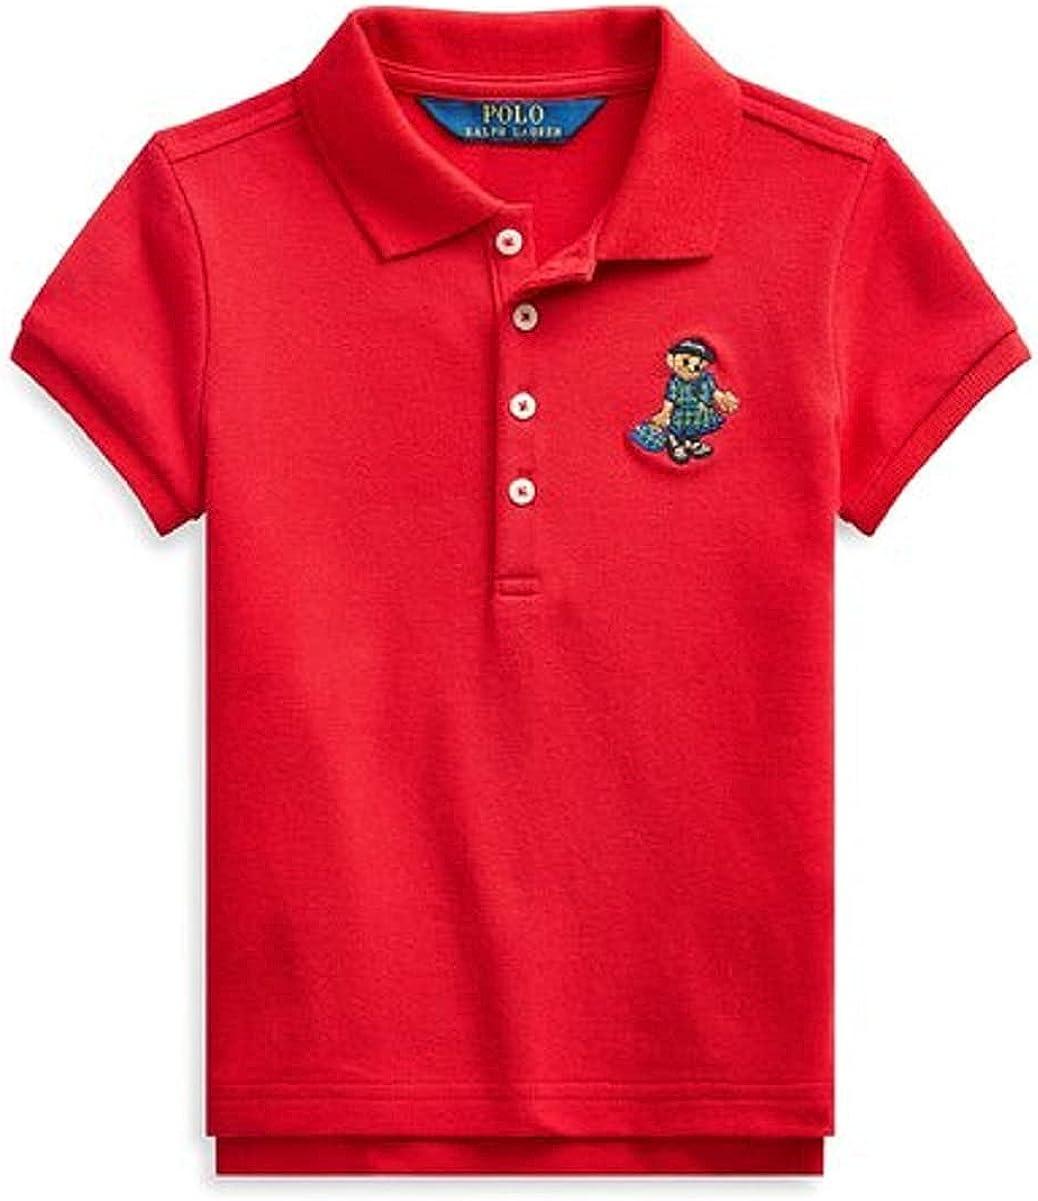 Polo Ralph Lauren RED Boys Short Sleeve Polo Shirt, US 2/2T